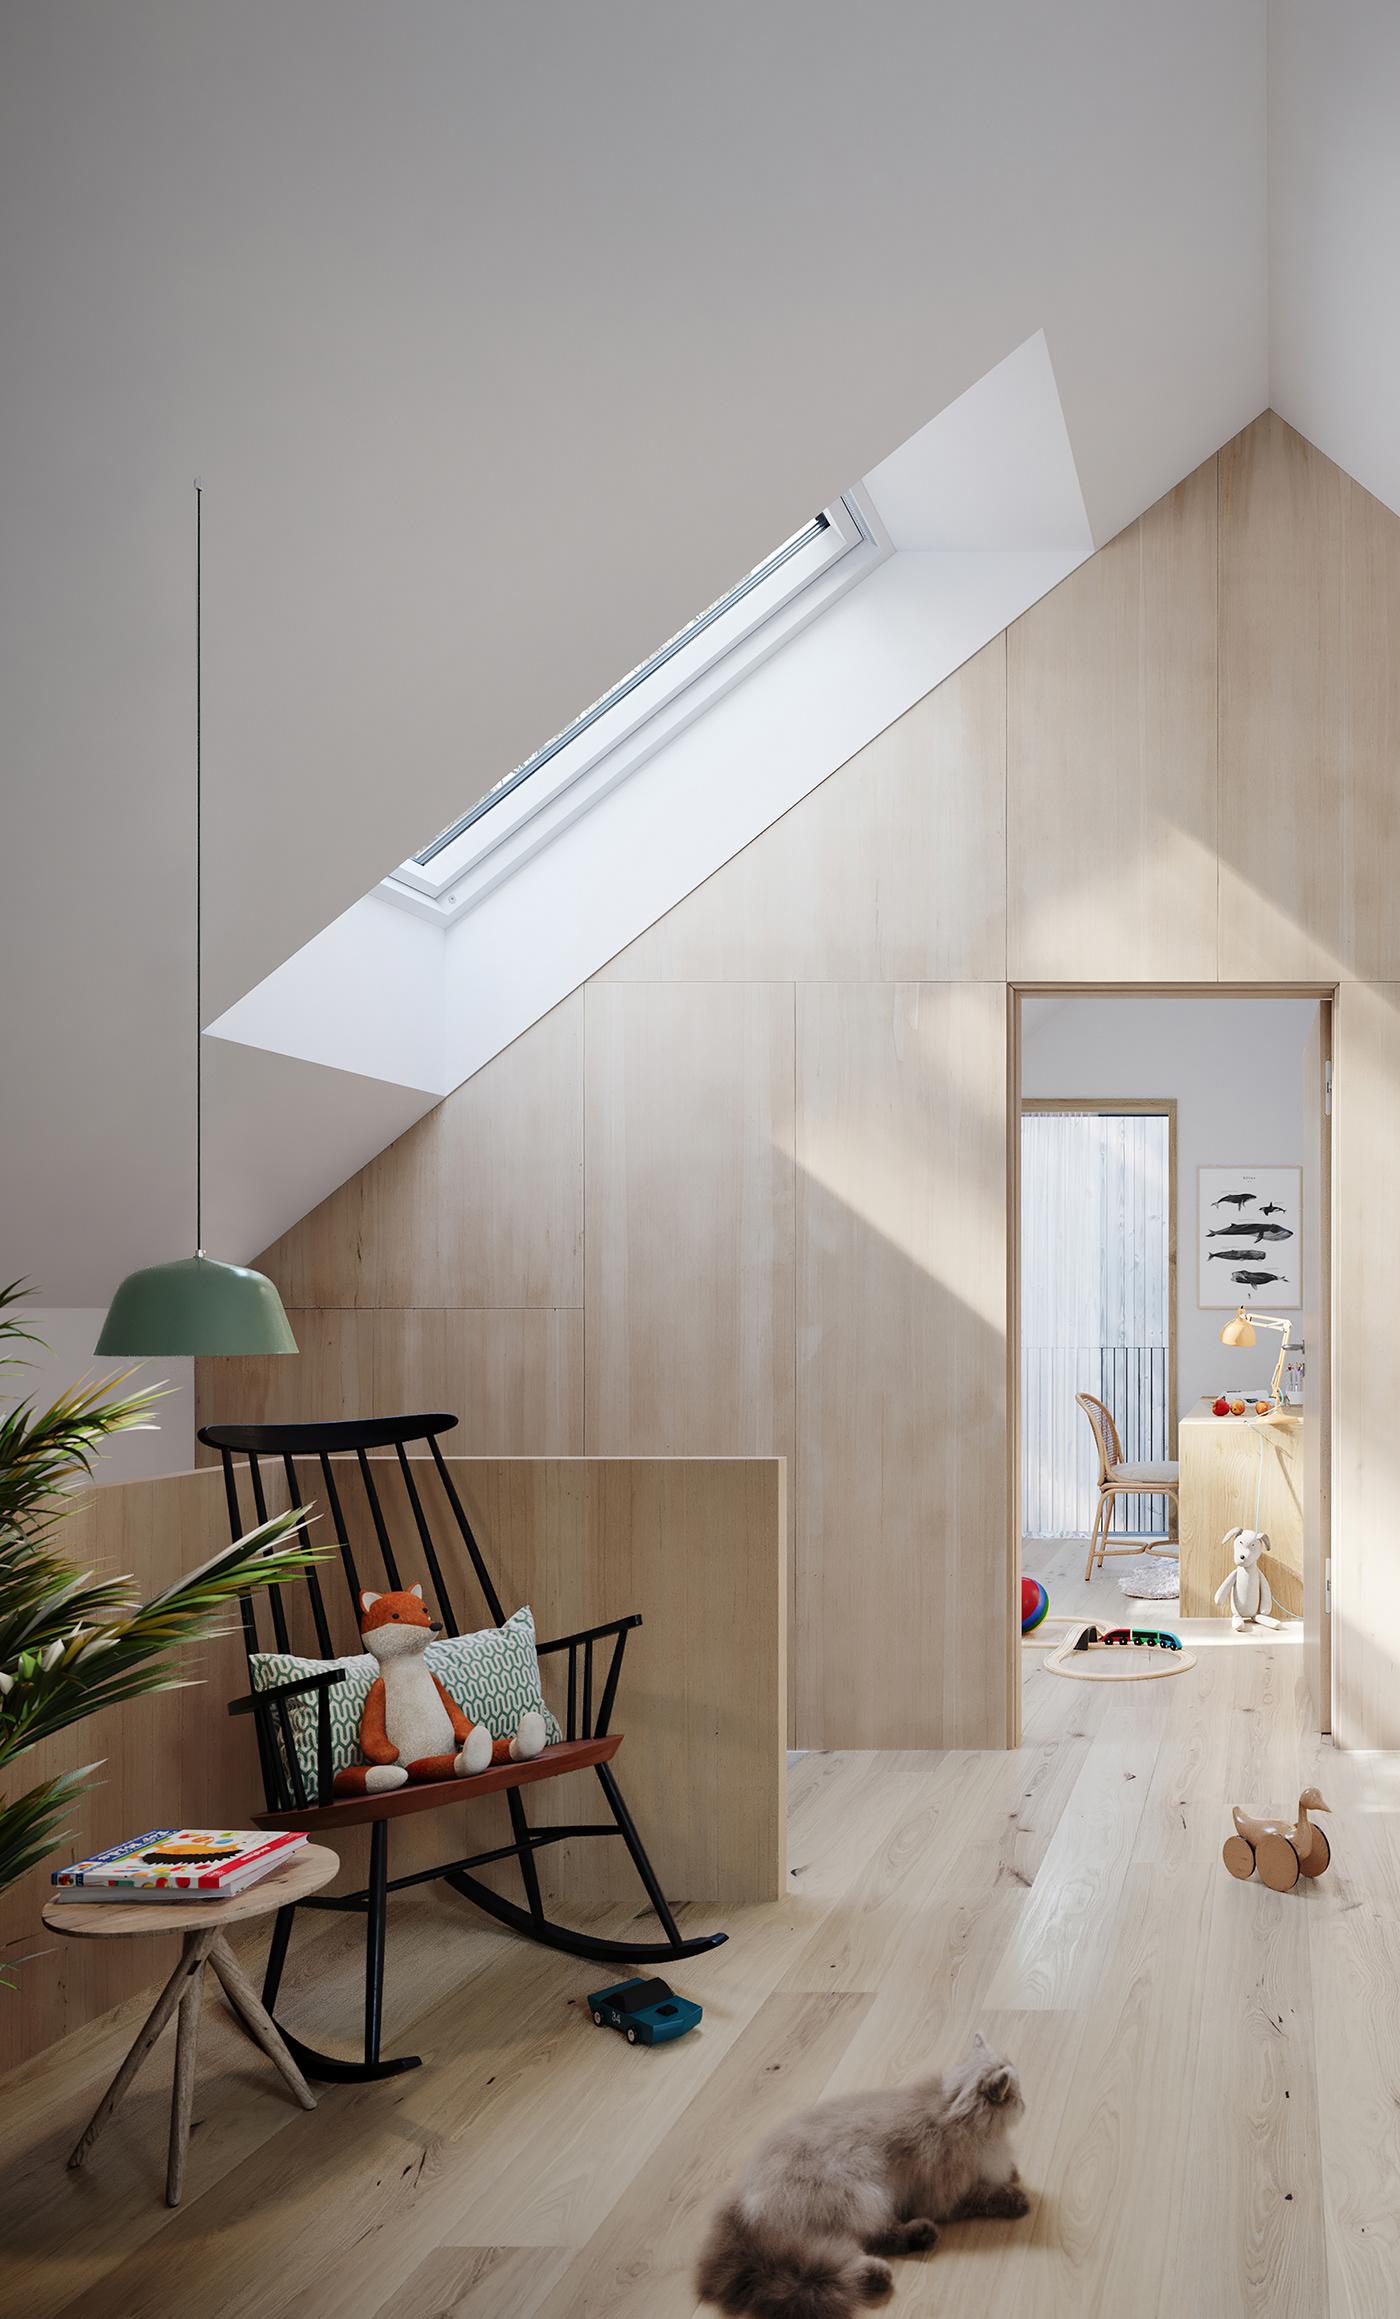 architecture design Interior CGI visualization coronarenderer 3D norway Scandinavia